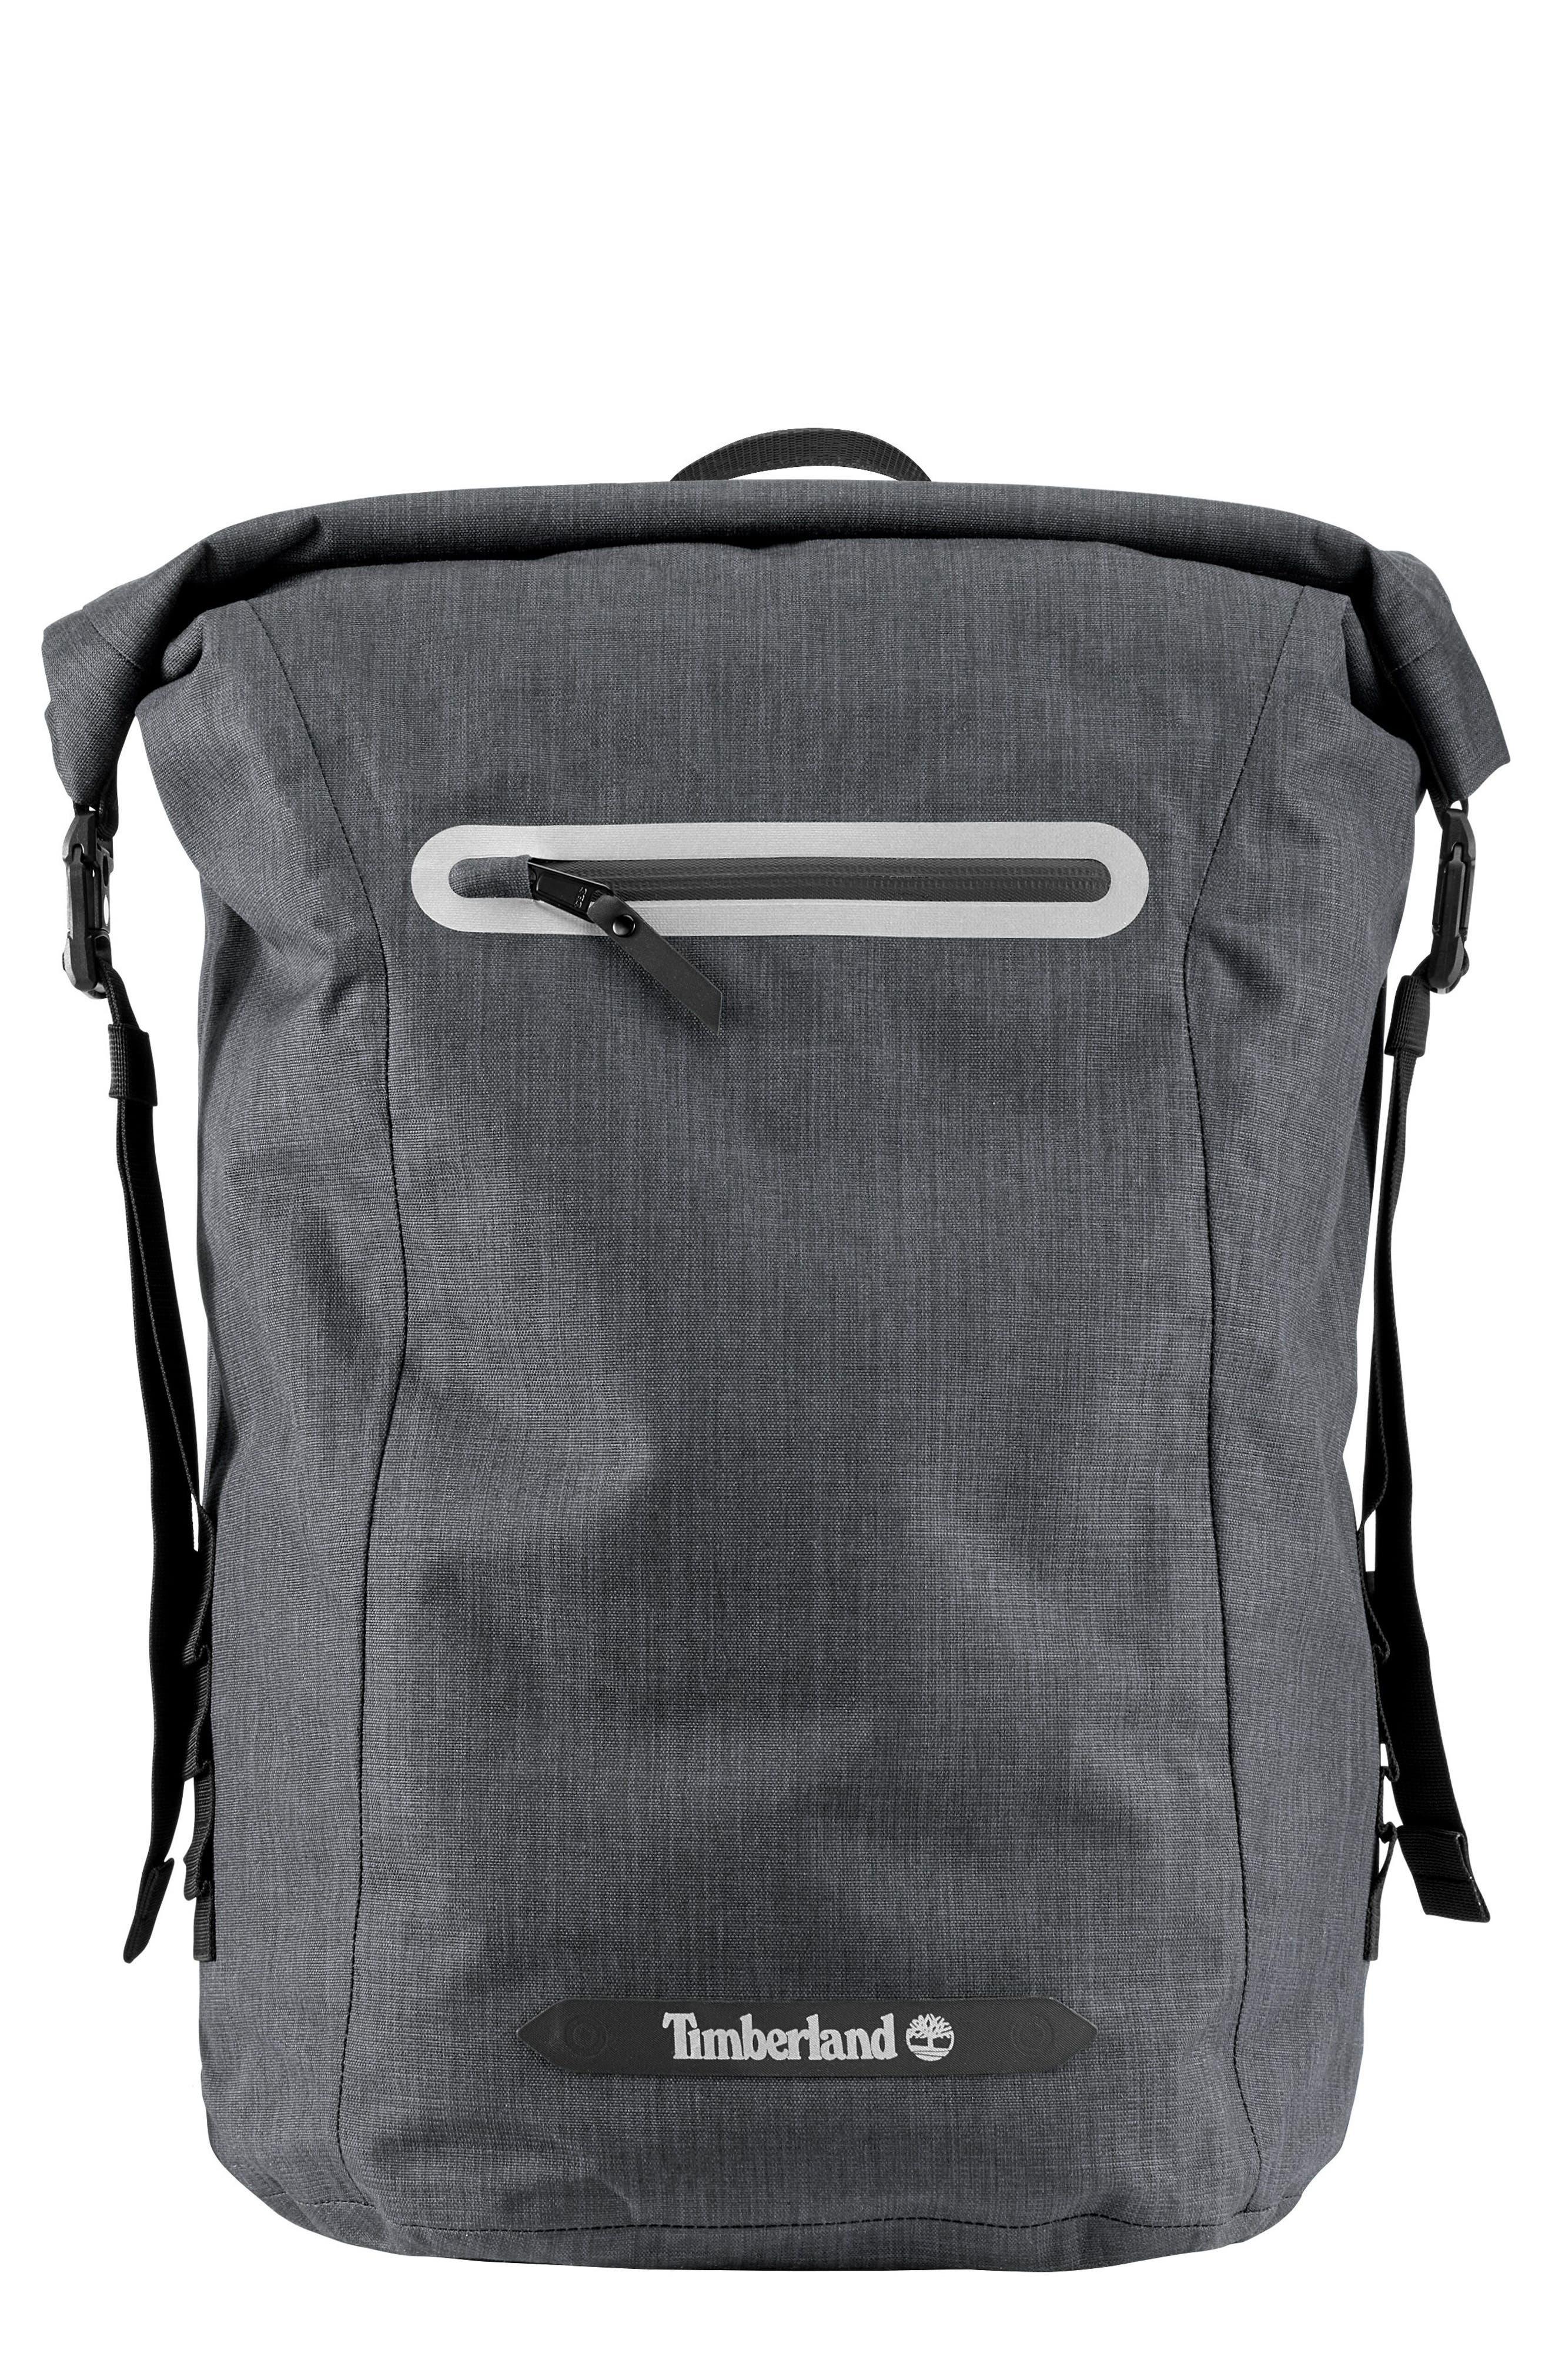 Timberland Baxter Lake Waterproof Roll Top Backpack